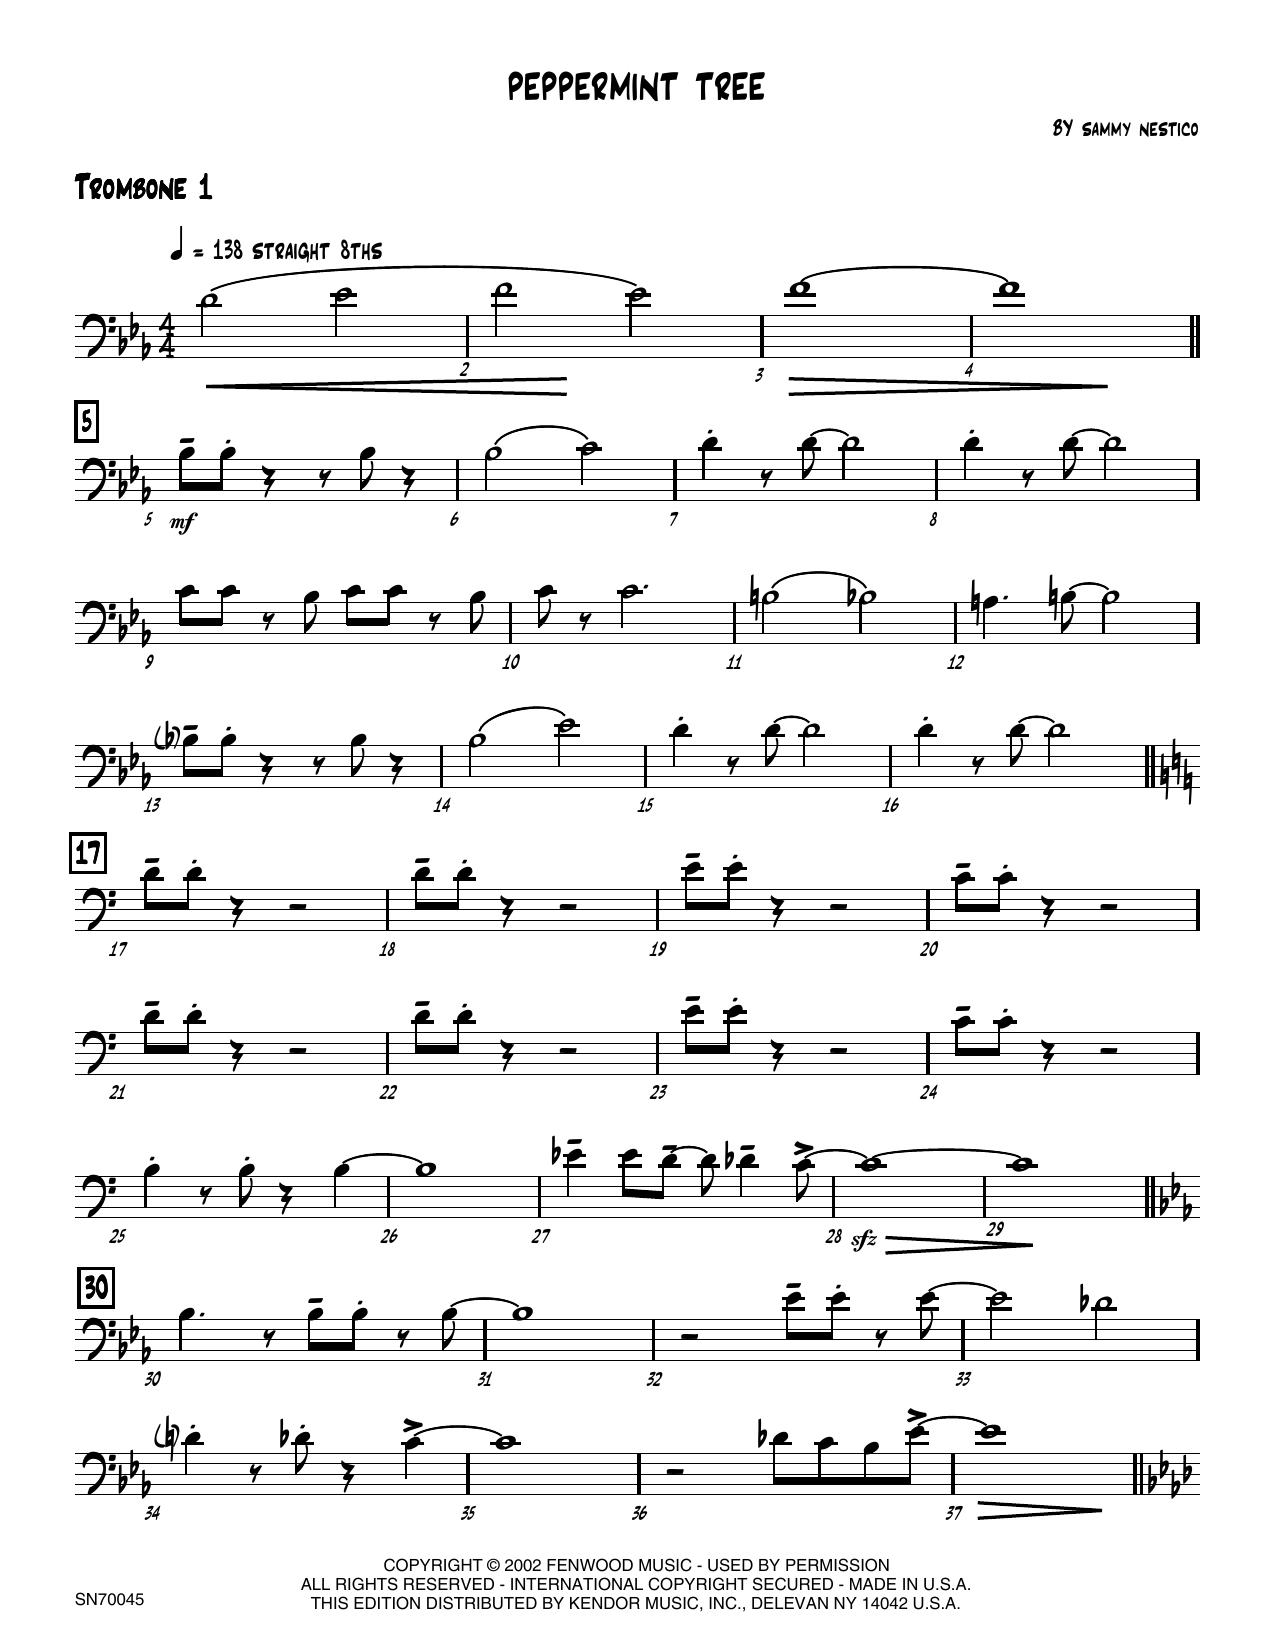 Peppermint Tree - 1st Trombone Sheet Music